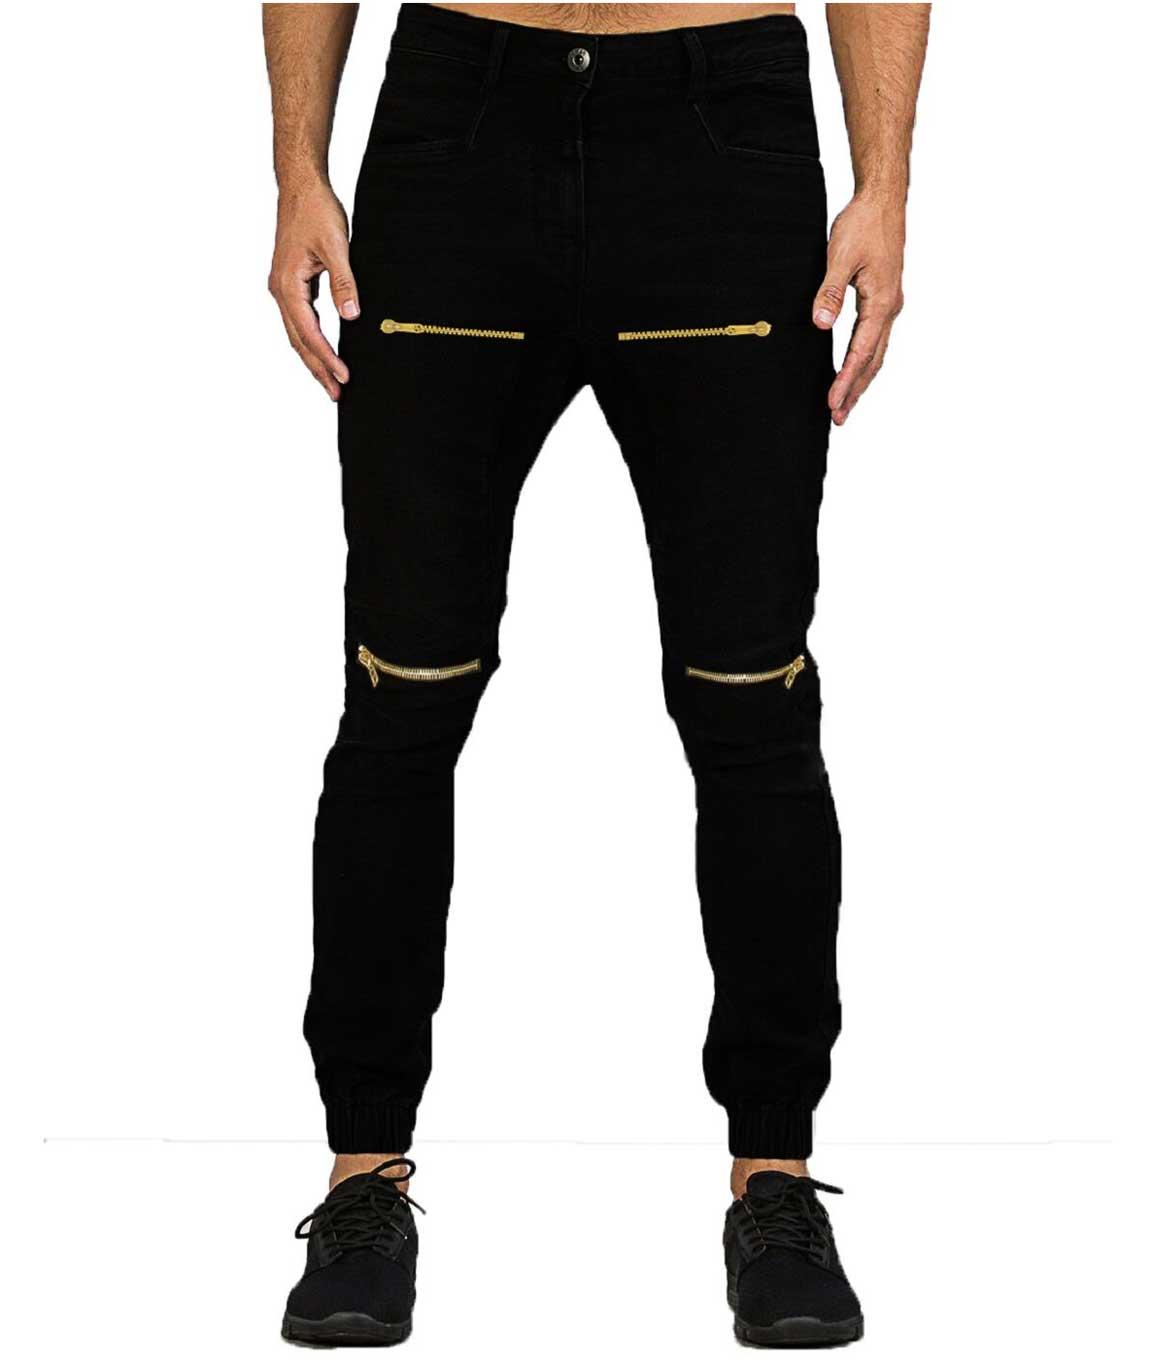 Stylish BLACK slim fit Double chain jogger